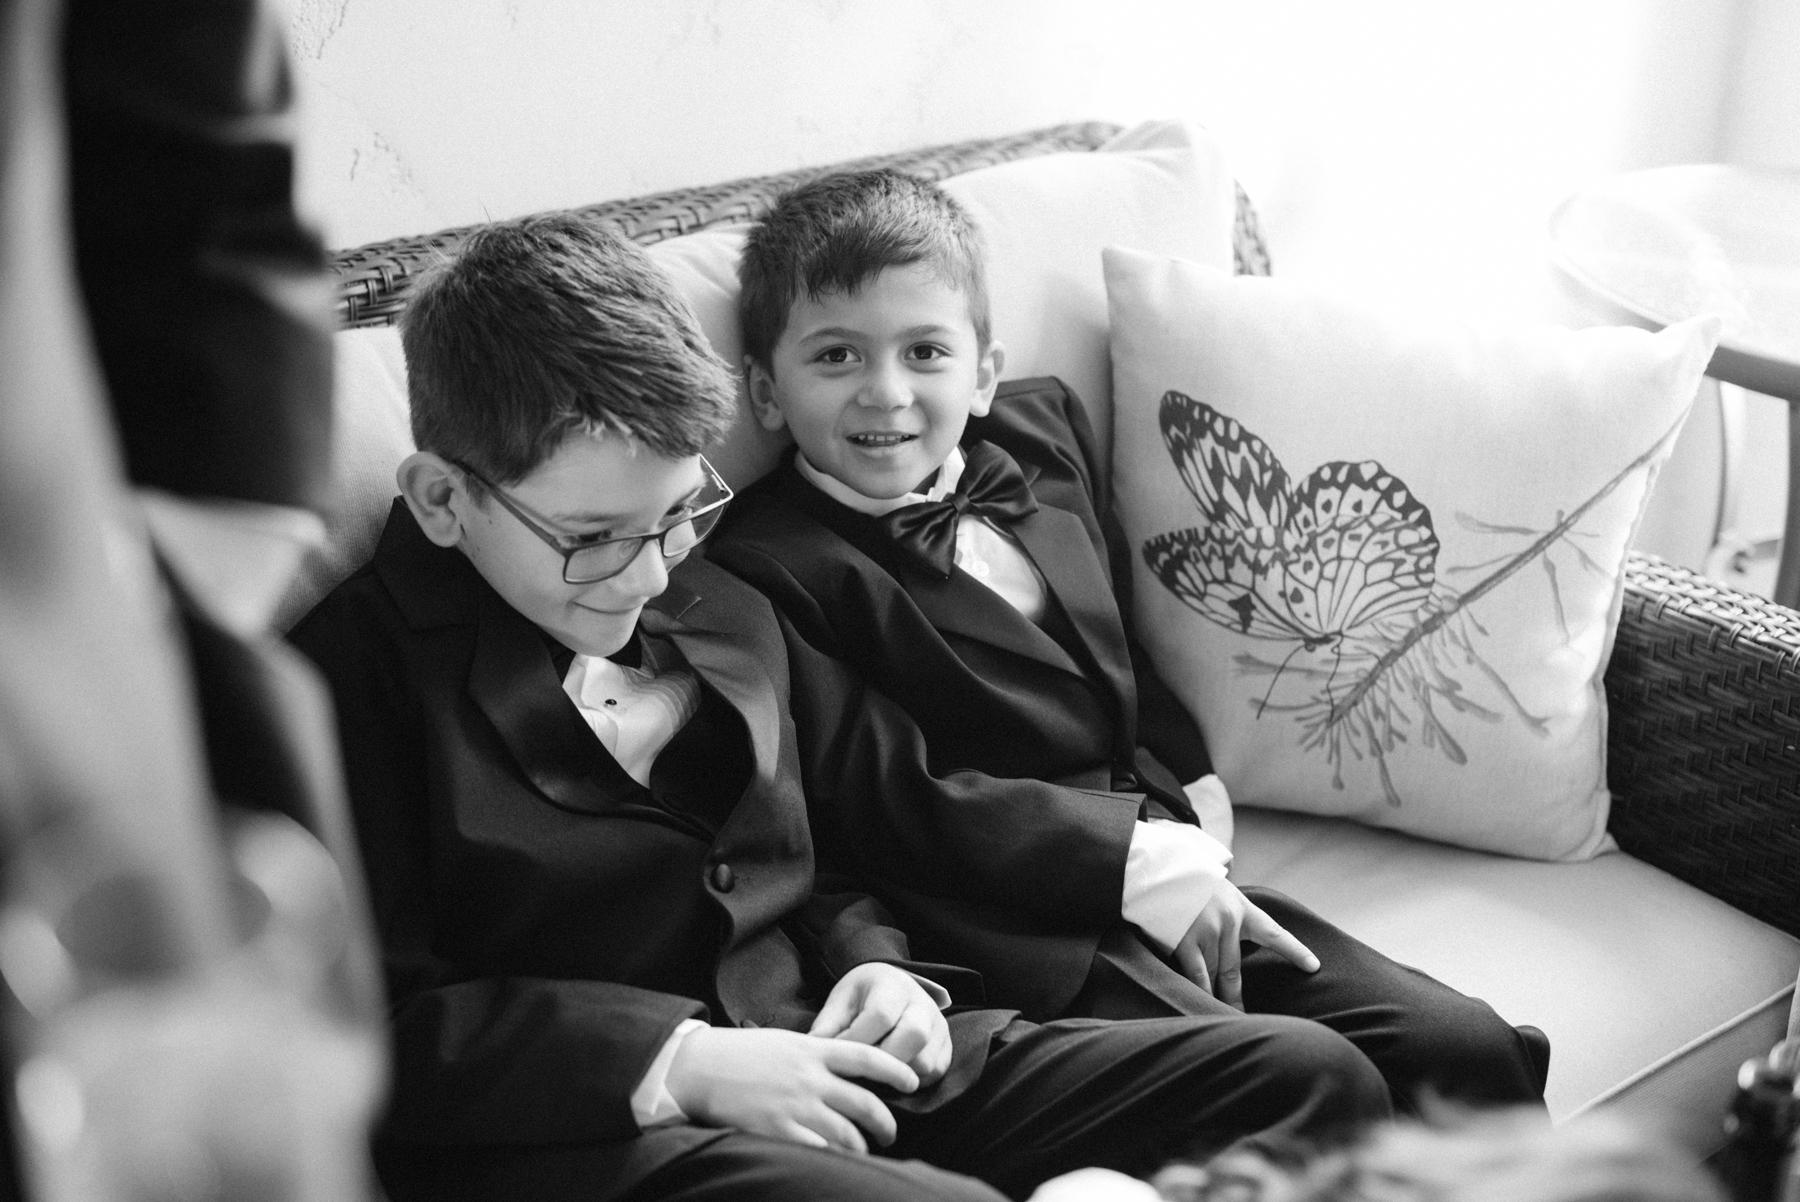 Secret Garden Event Center Wedding - Meredith Amadee Photography-83.jpg